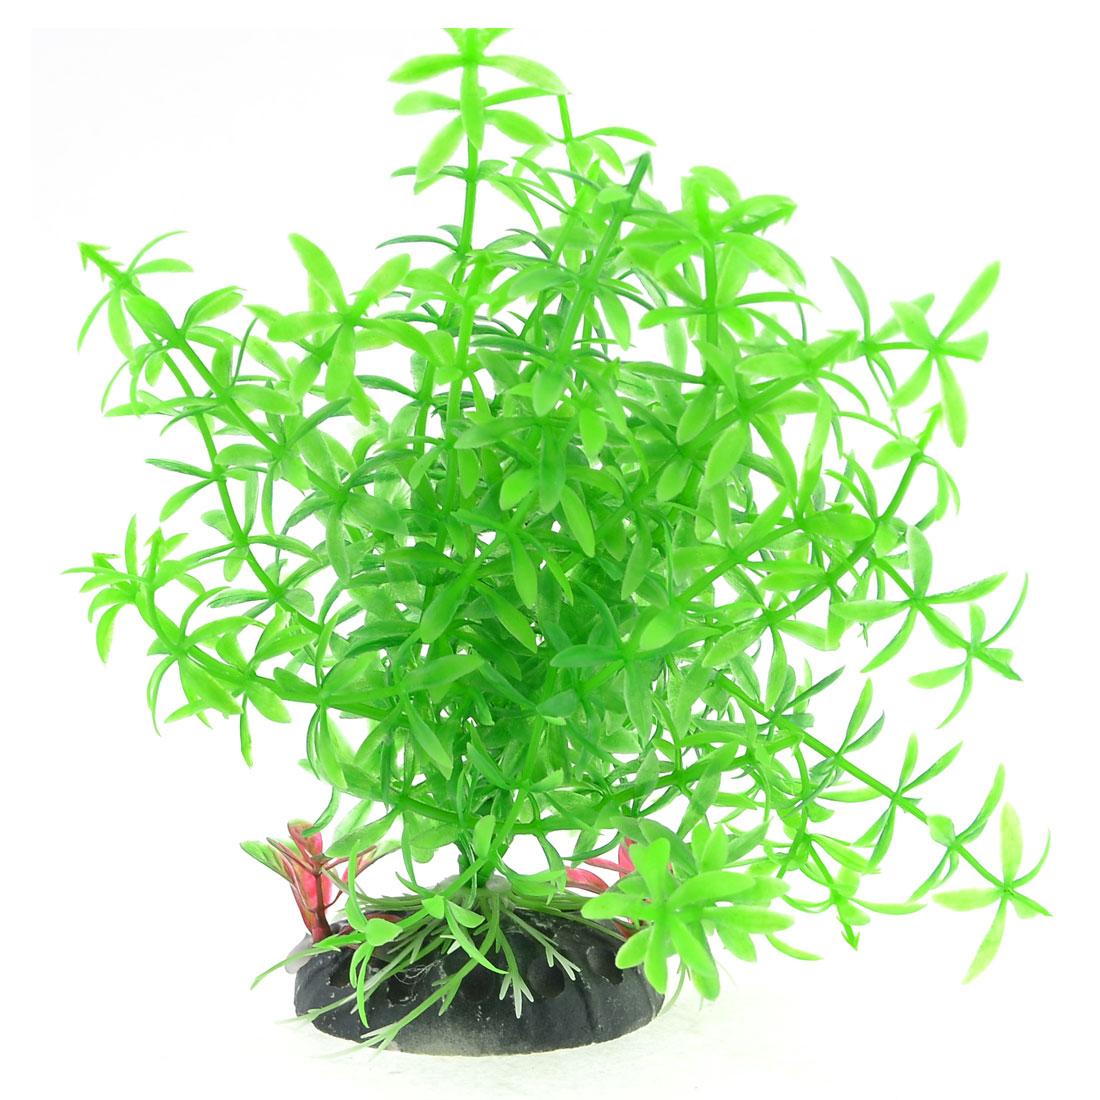 Unique Bargains 5.7 Tall Green Lifelike Artificial Grass Plant Decor for Aquarium